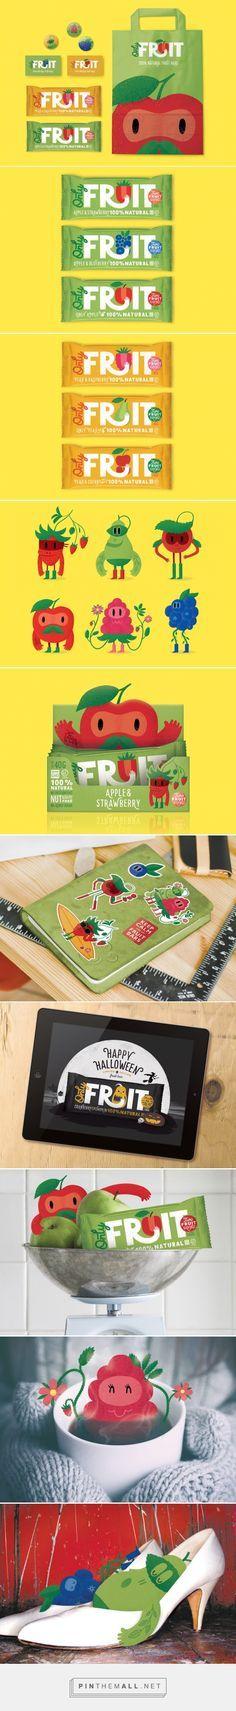 Only Fruit #fruitbar #concept #packaging designed by Maria Mordvintseva-Keeler - http://www.packagingoftheworld.com/2015/07/only-fruit-concept.html